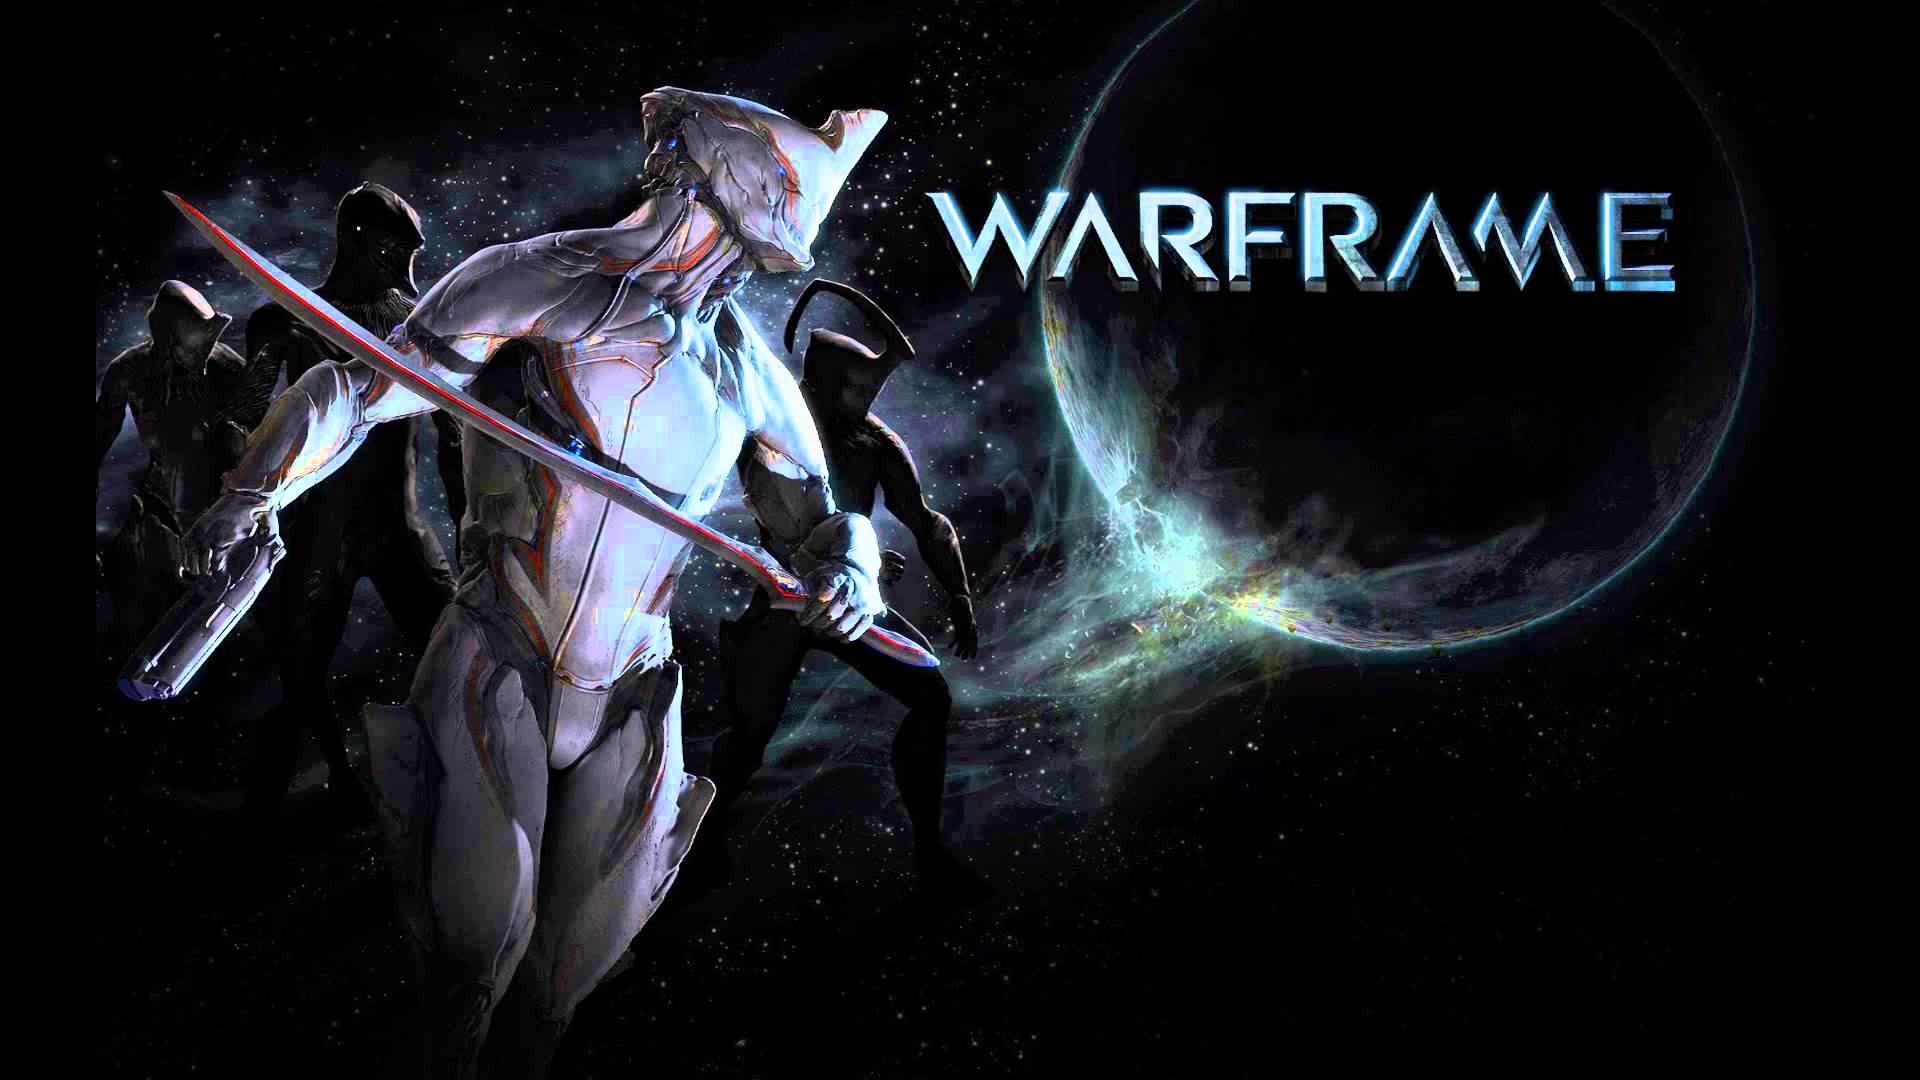 WARFRAME sci-fi warrior armor robot cyborg space stars planet poster f  wallpaper